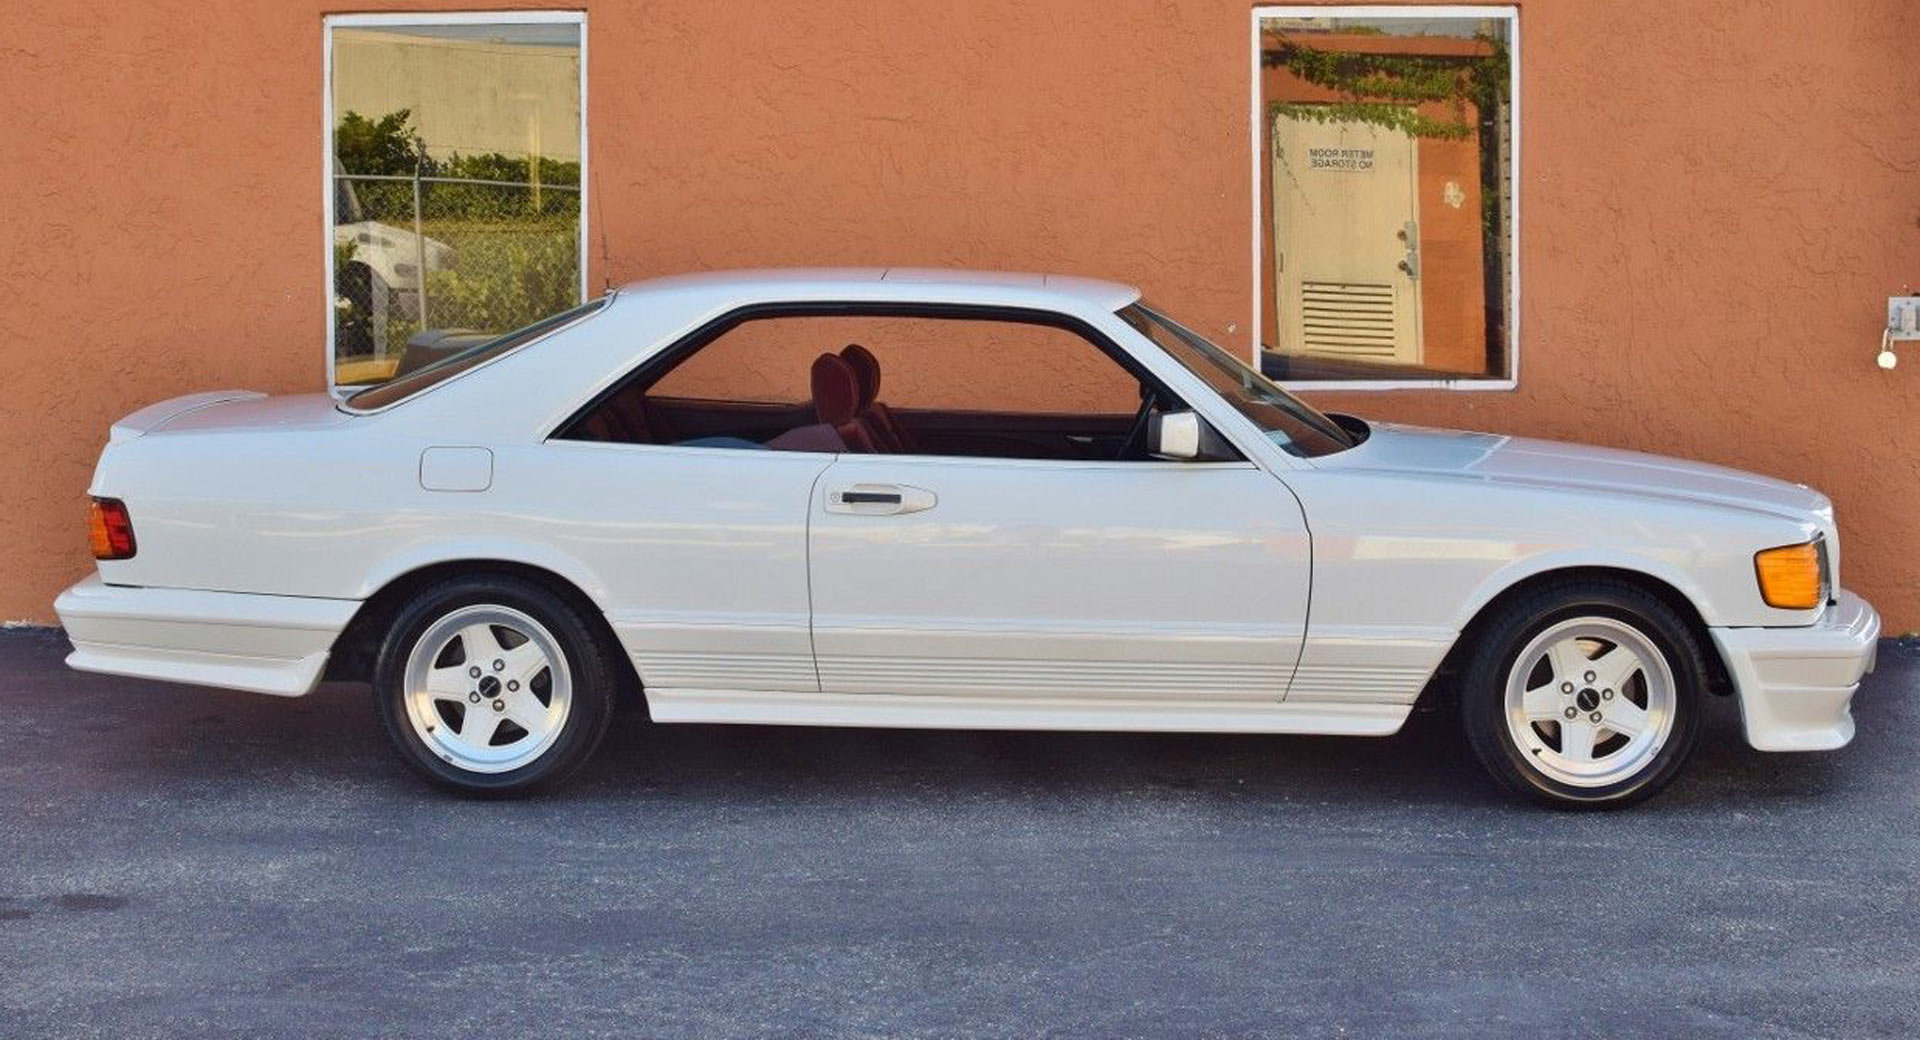 1985 Mercedes Benz 500 SEC AMG Is An All White $57k Bruiser